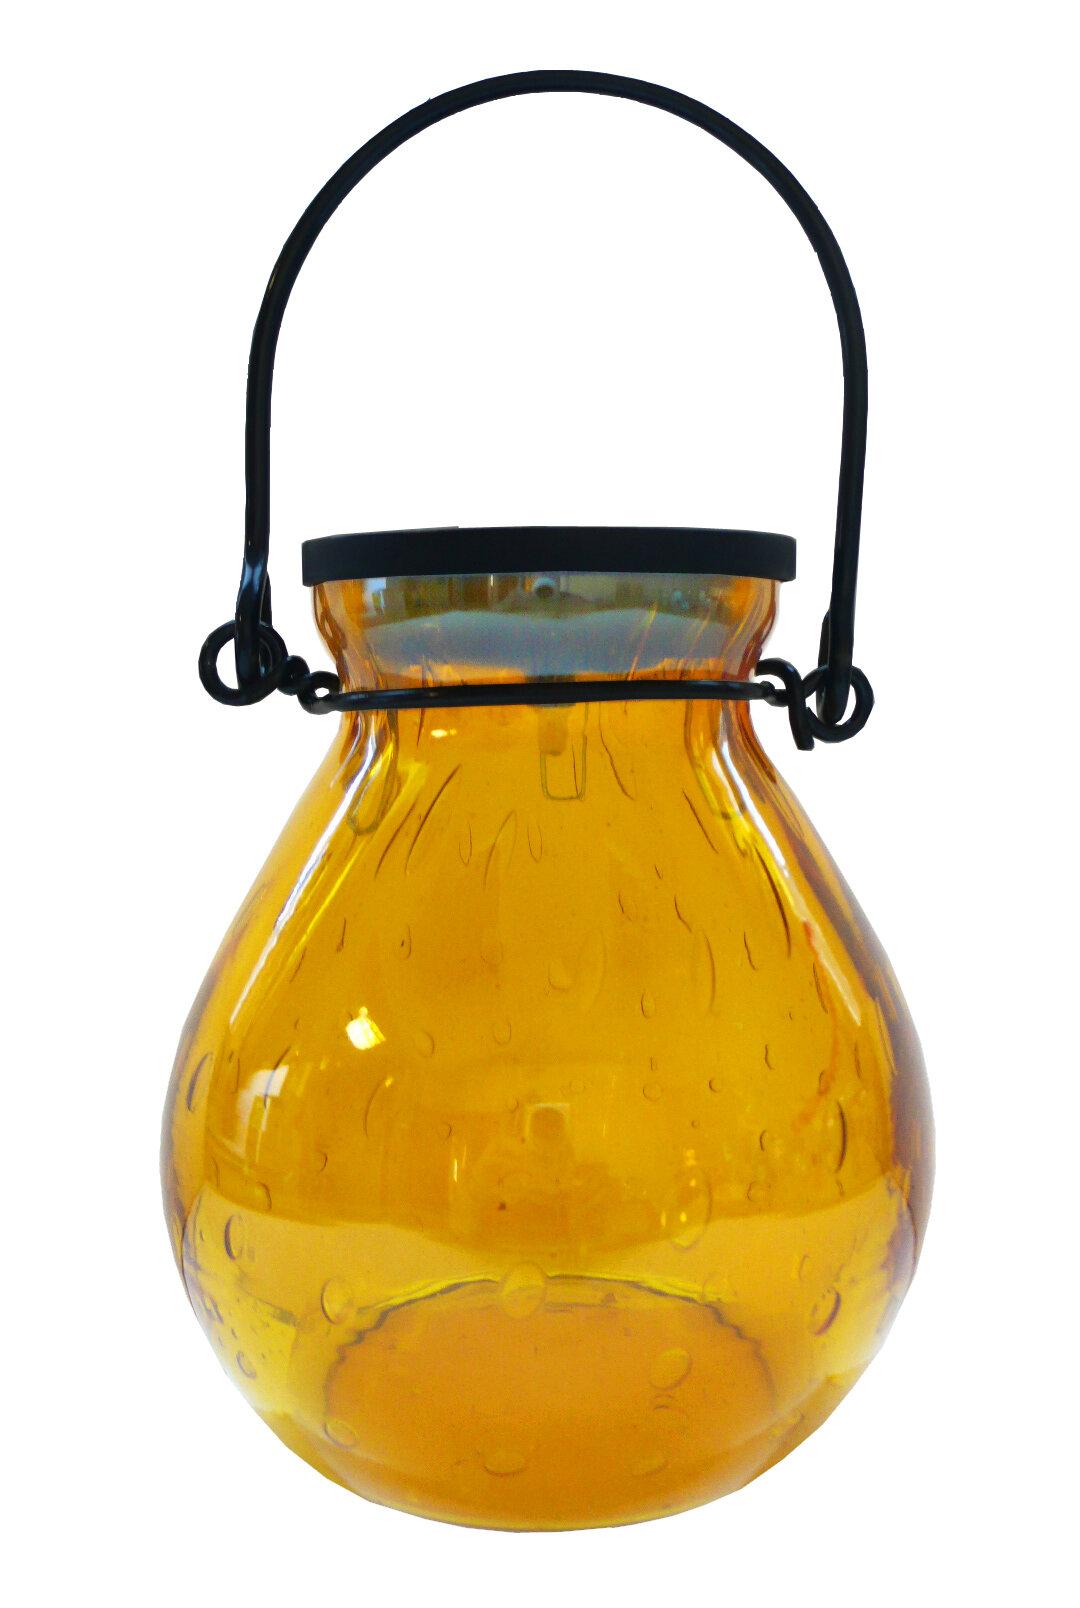 allsop home and garden bubble glass solar hanging lantern. Black Bedroom Furniture Sets. Home Design Ideas